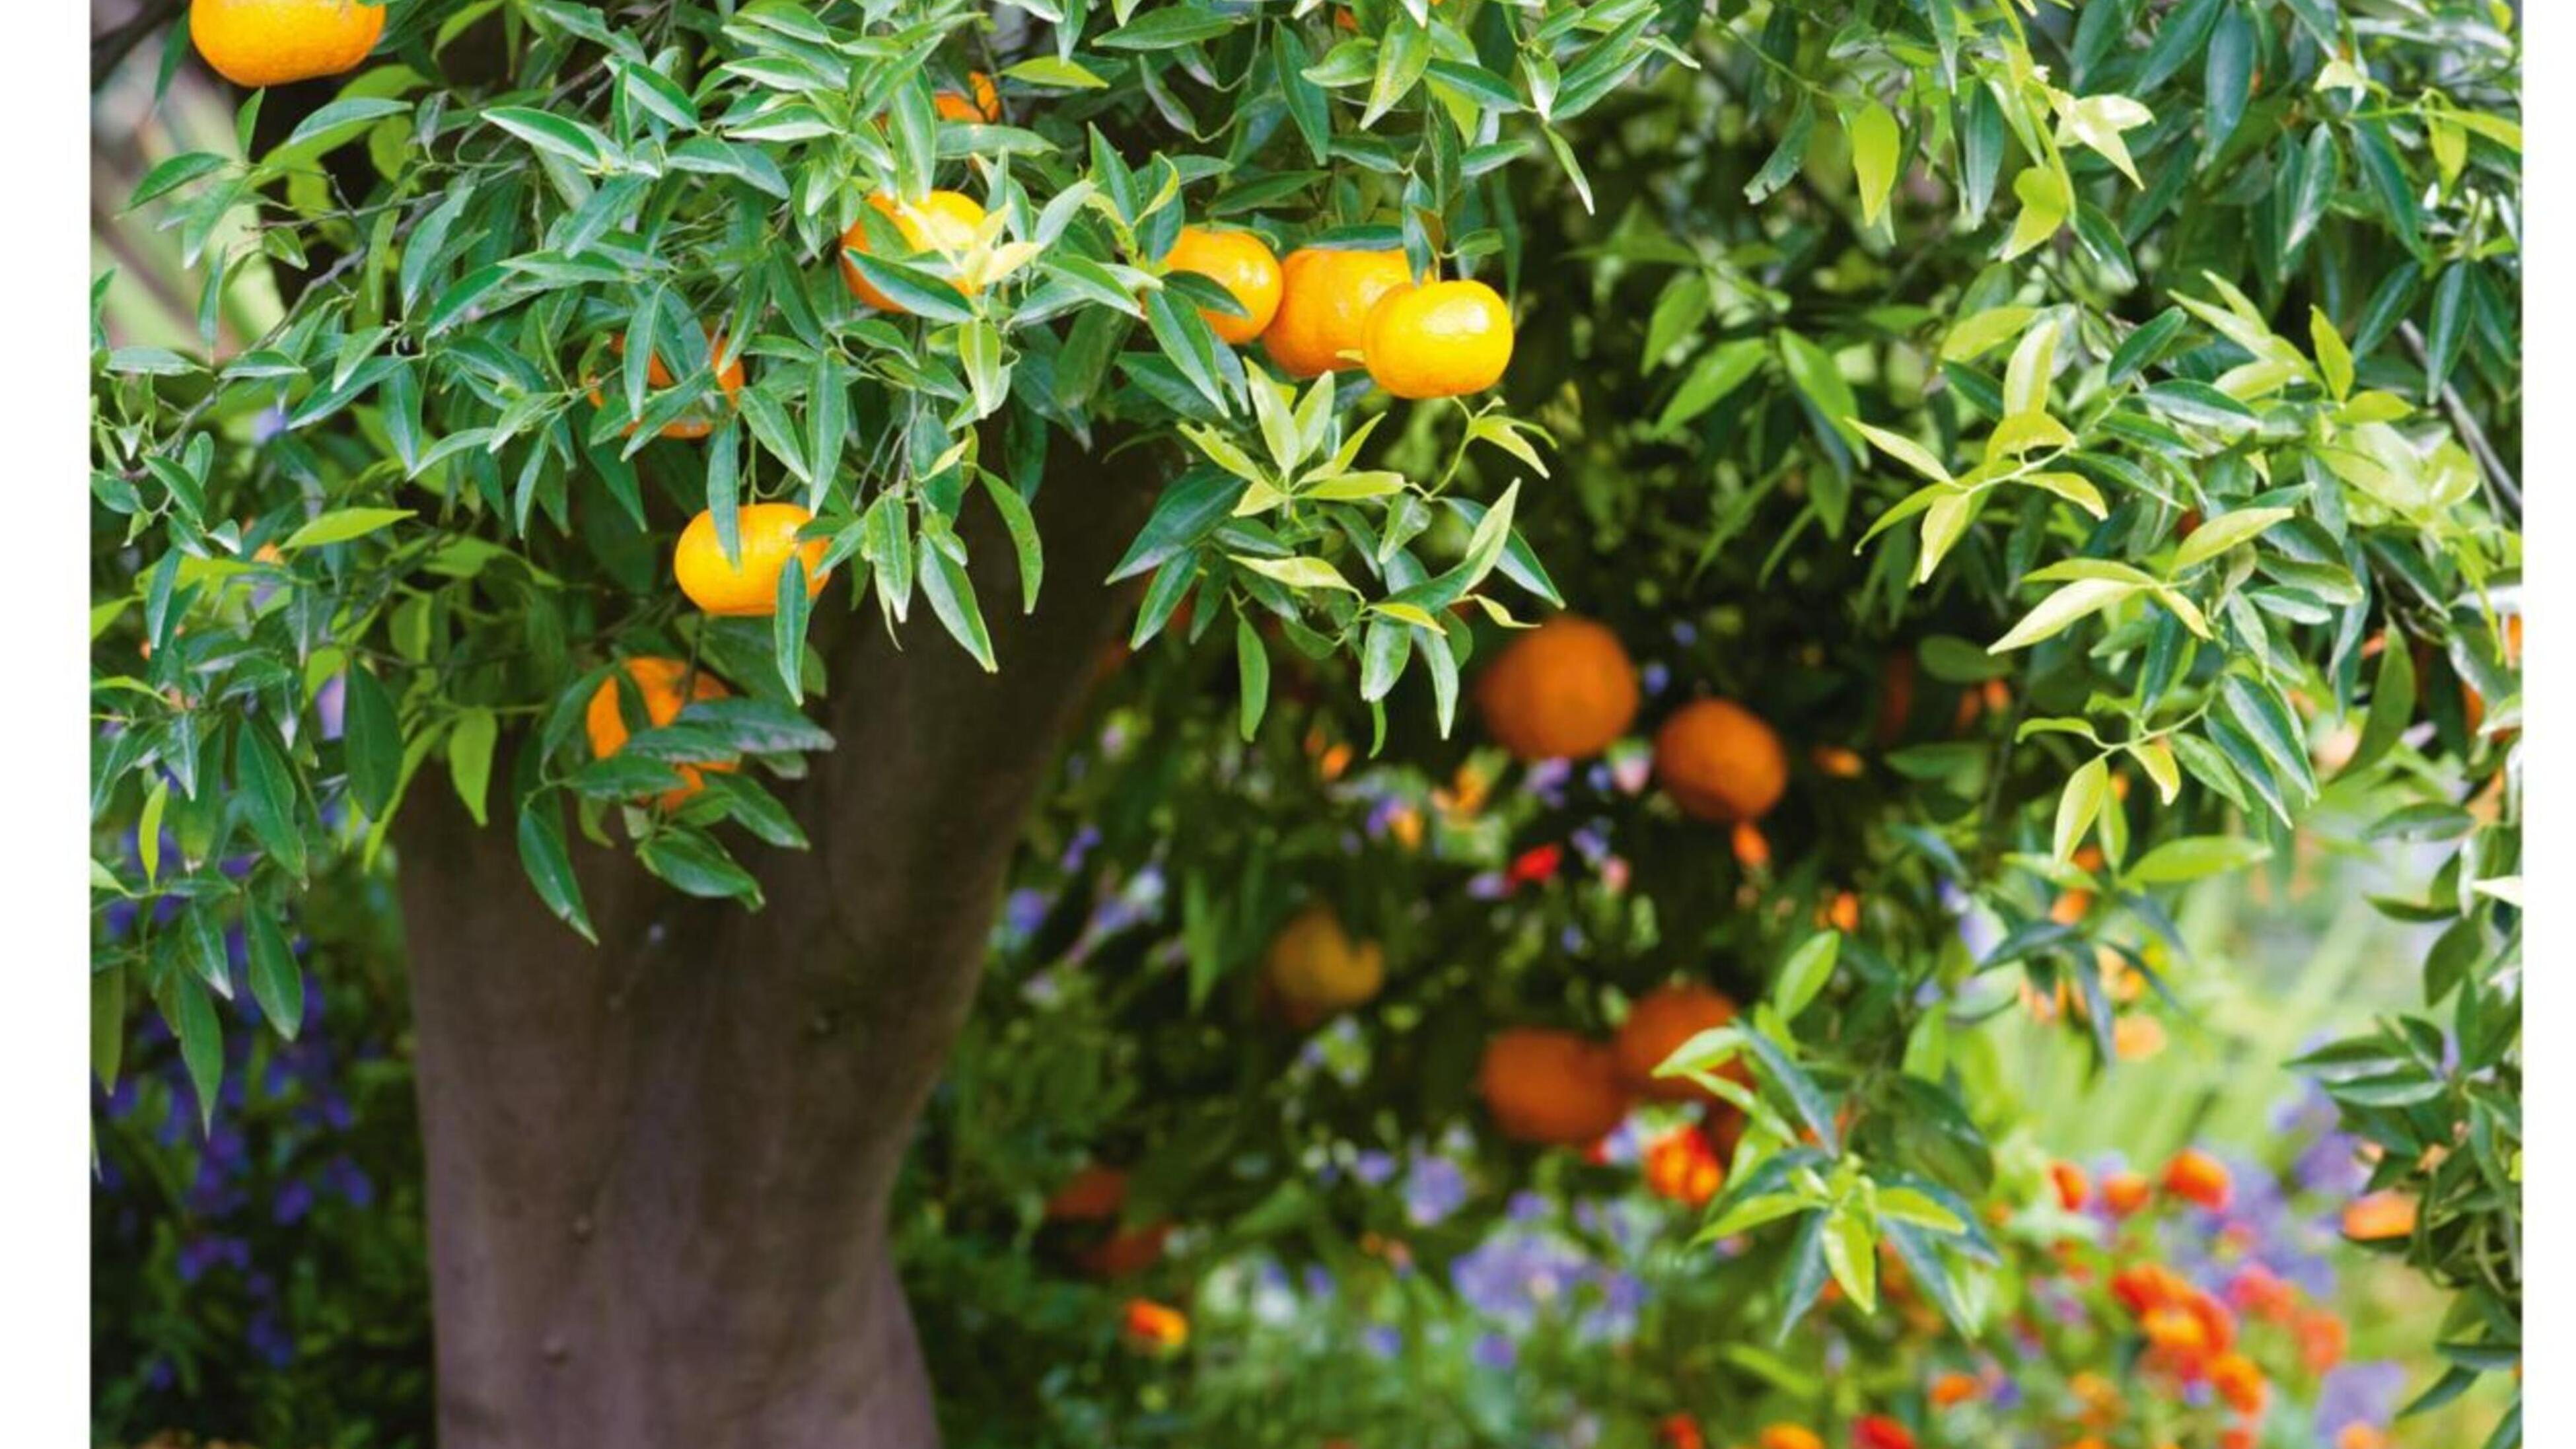 Mandarins growing on a fruit tree.